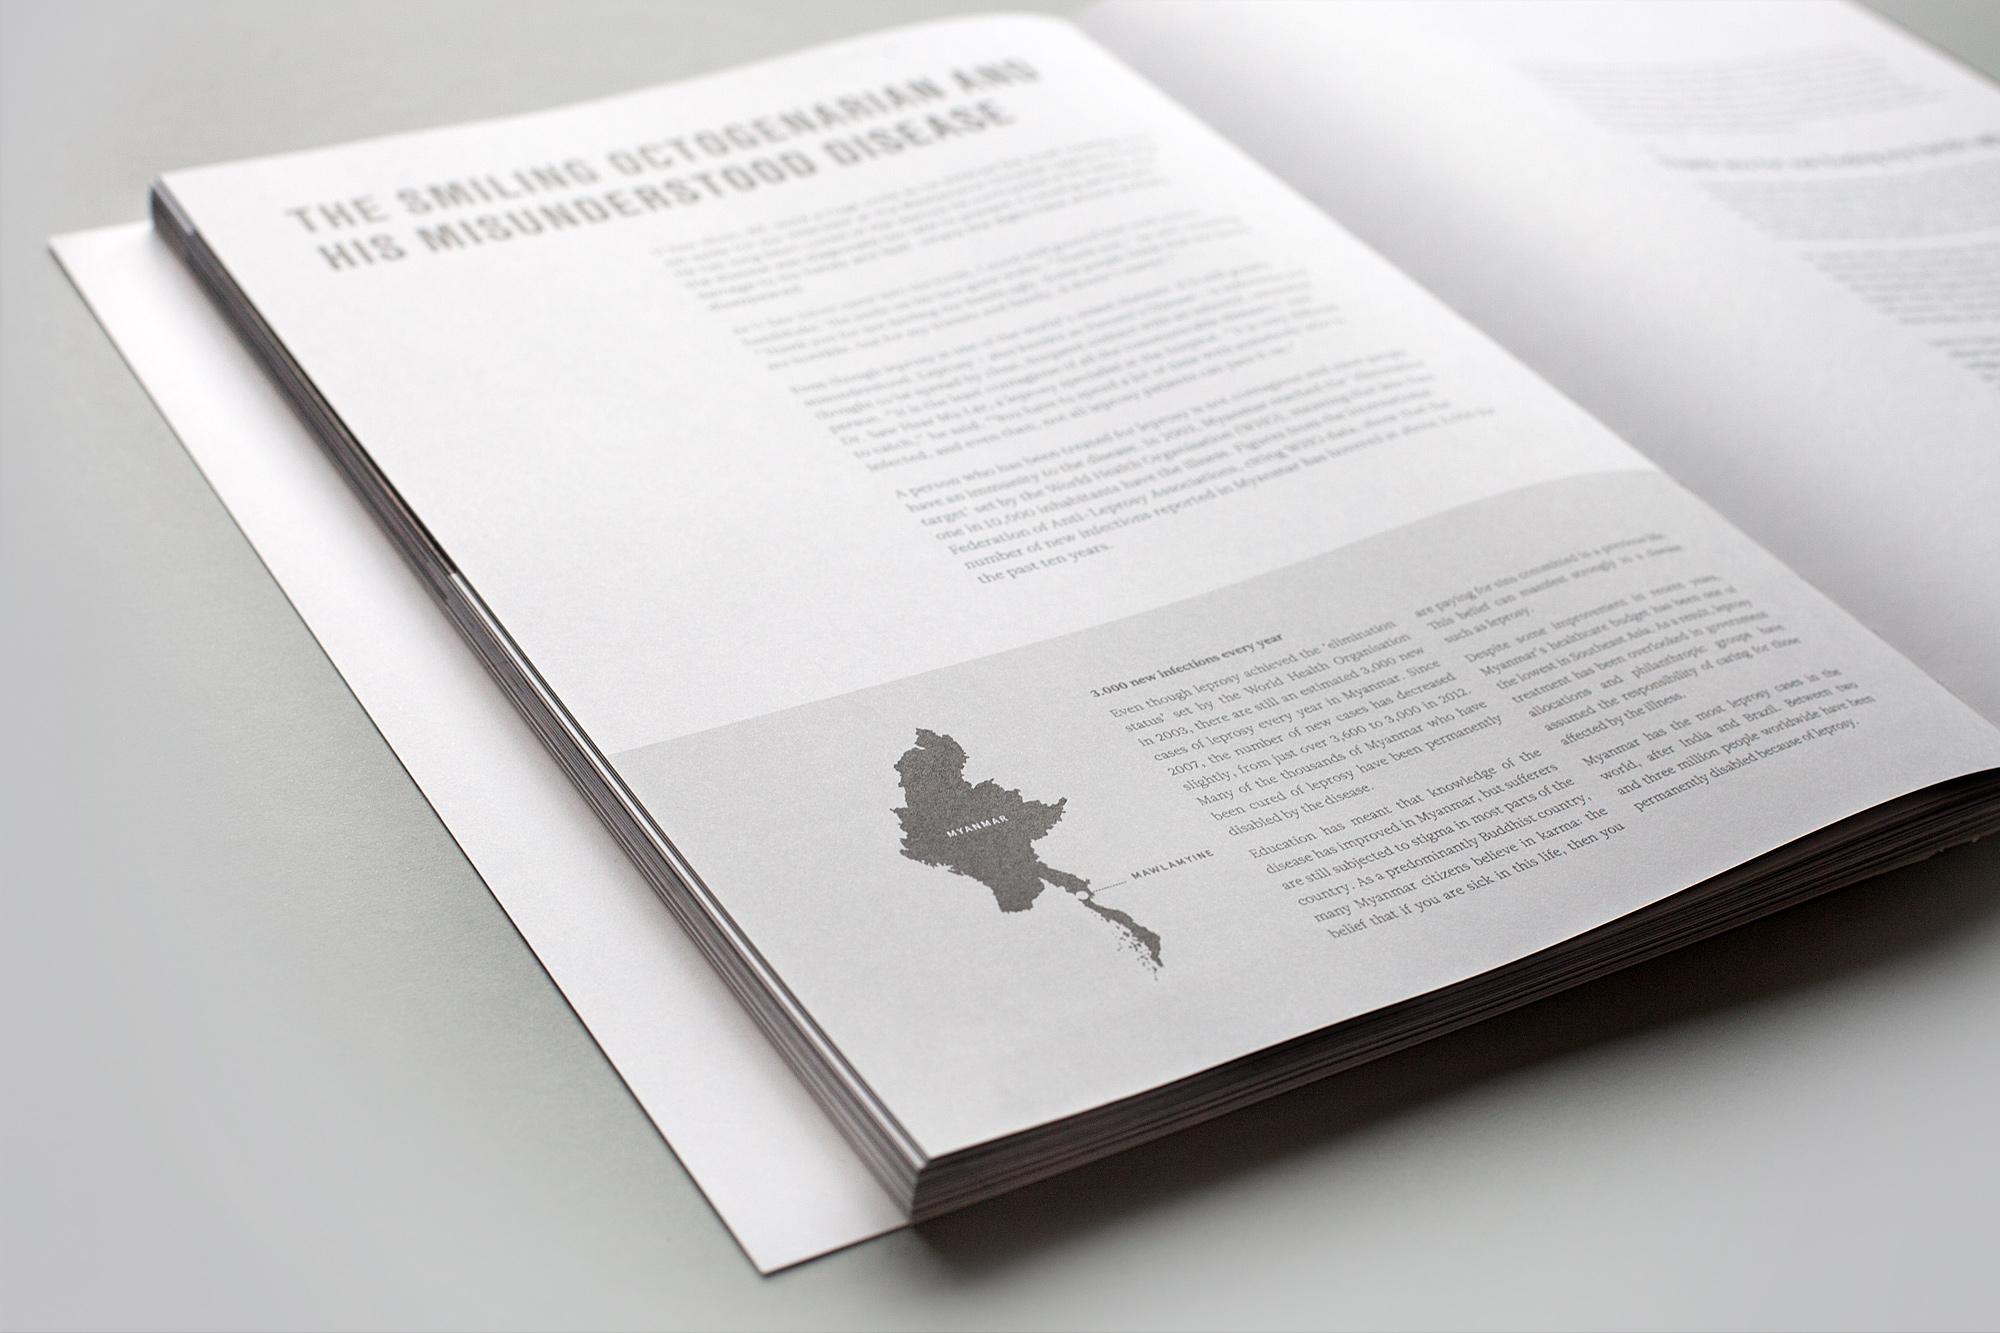 Book-detail01.jpg